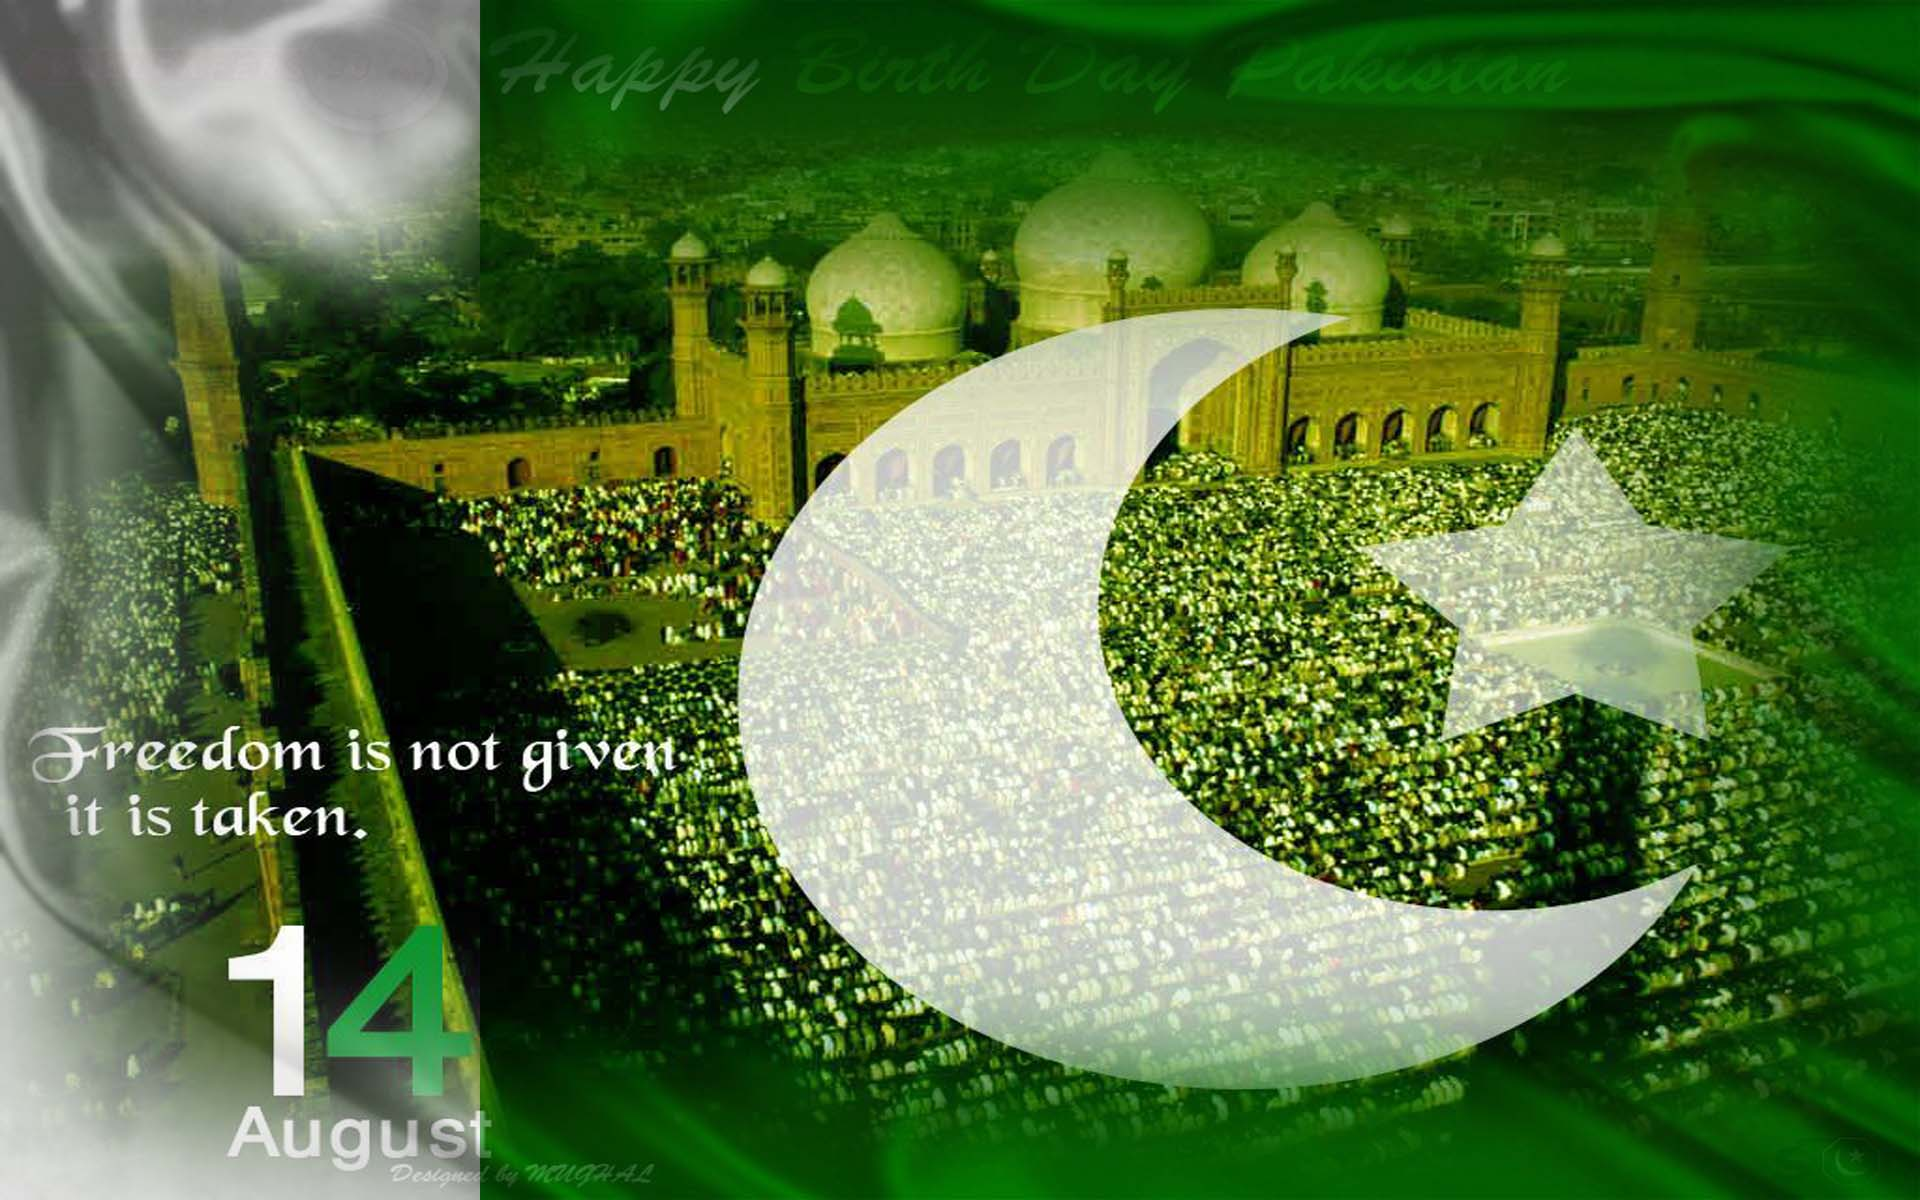 pakistan flag hd wallpapers - photo #38